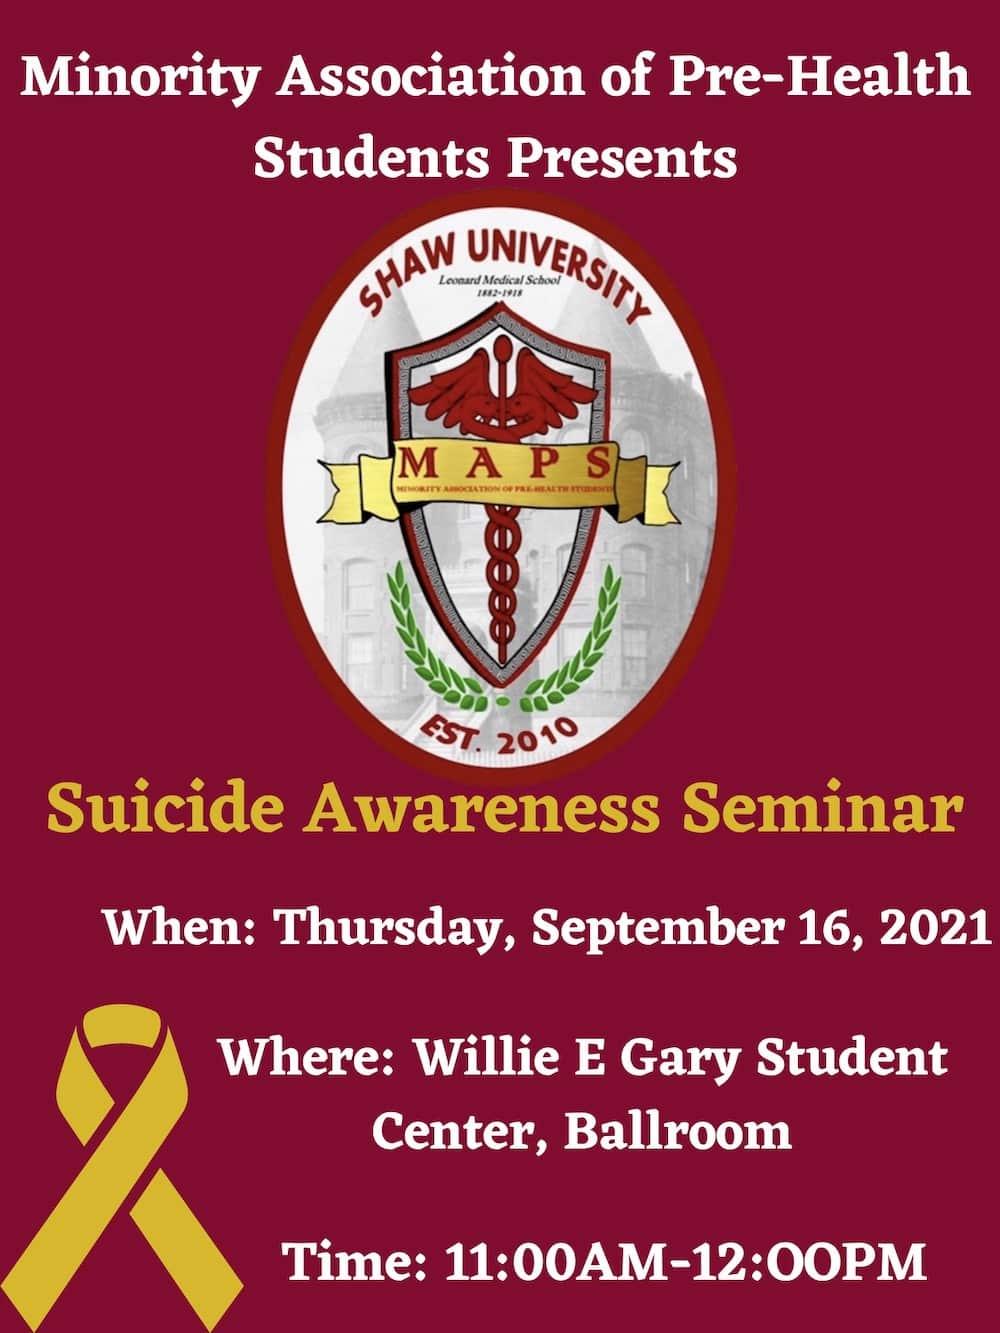 Minority-Association-of-Pre--Health-Students-Presents - suicide awareness seminar